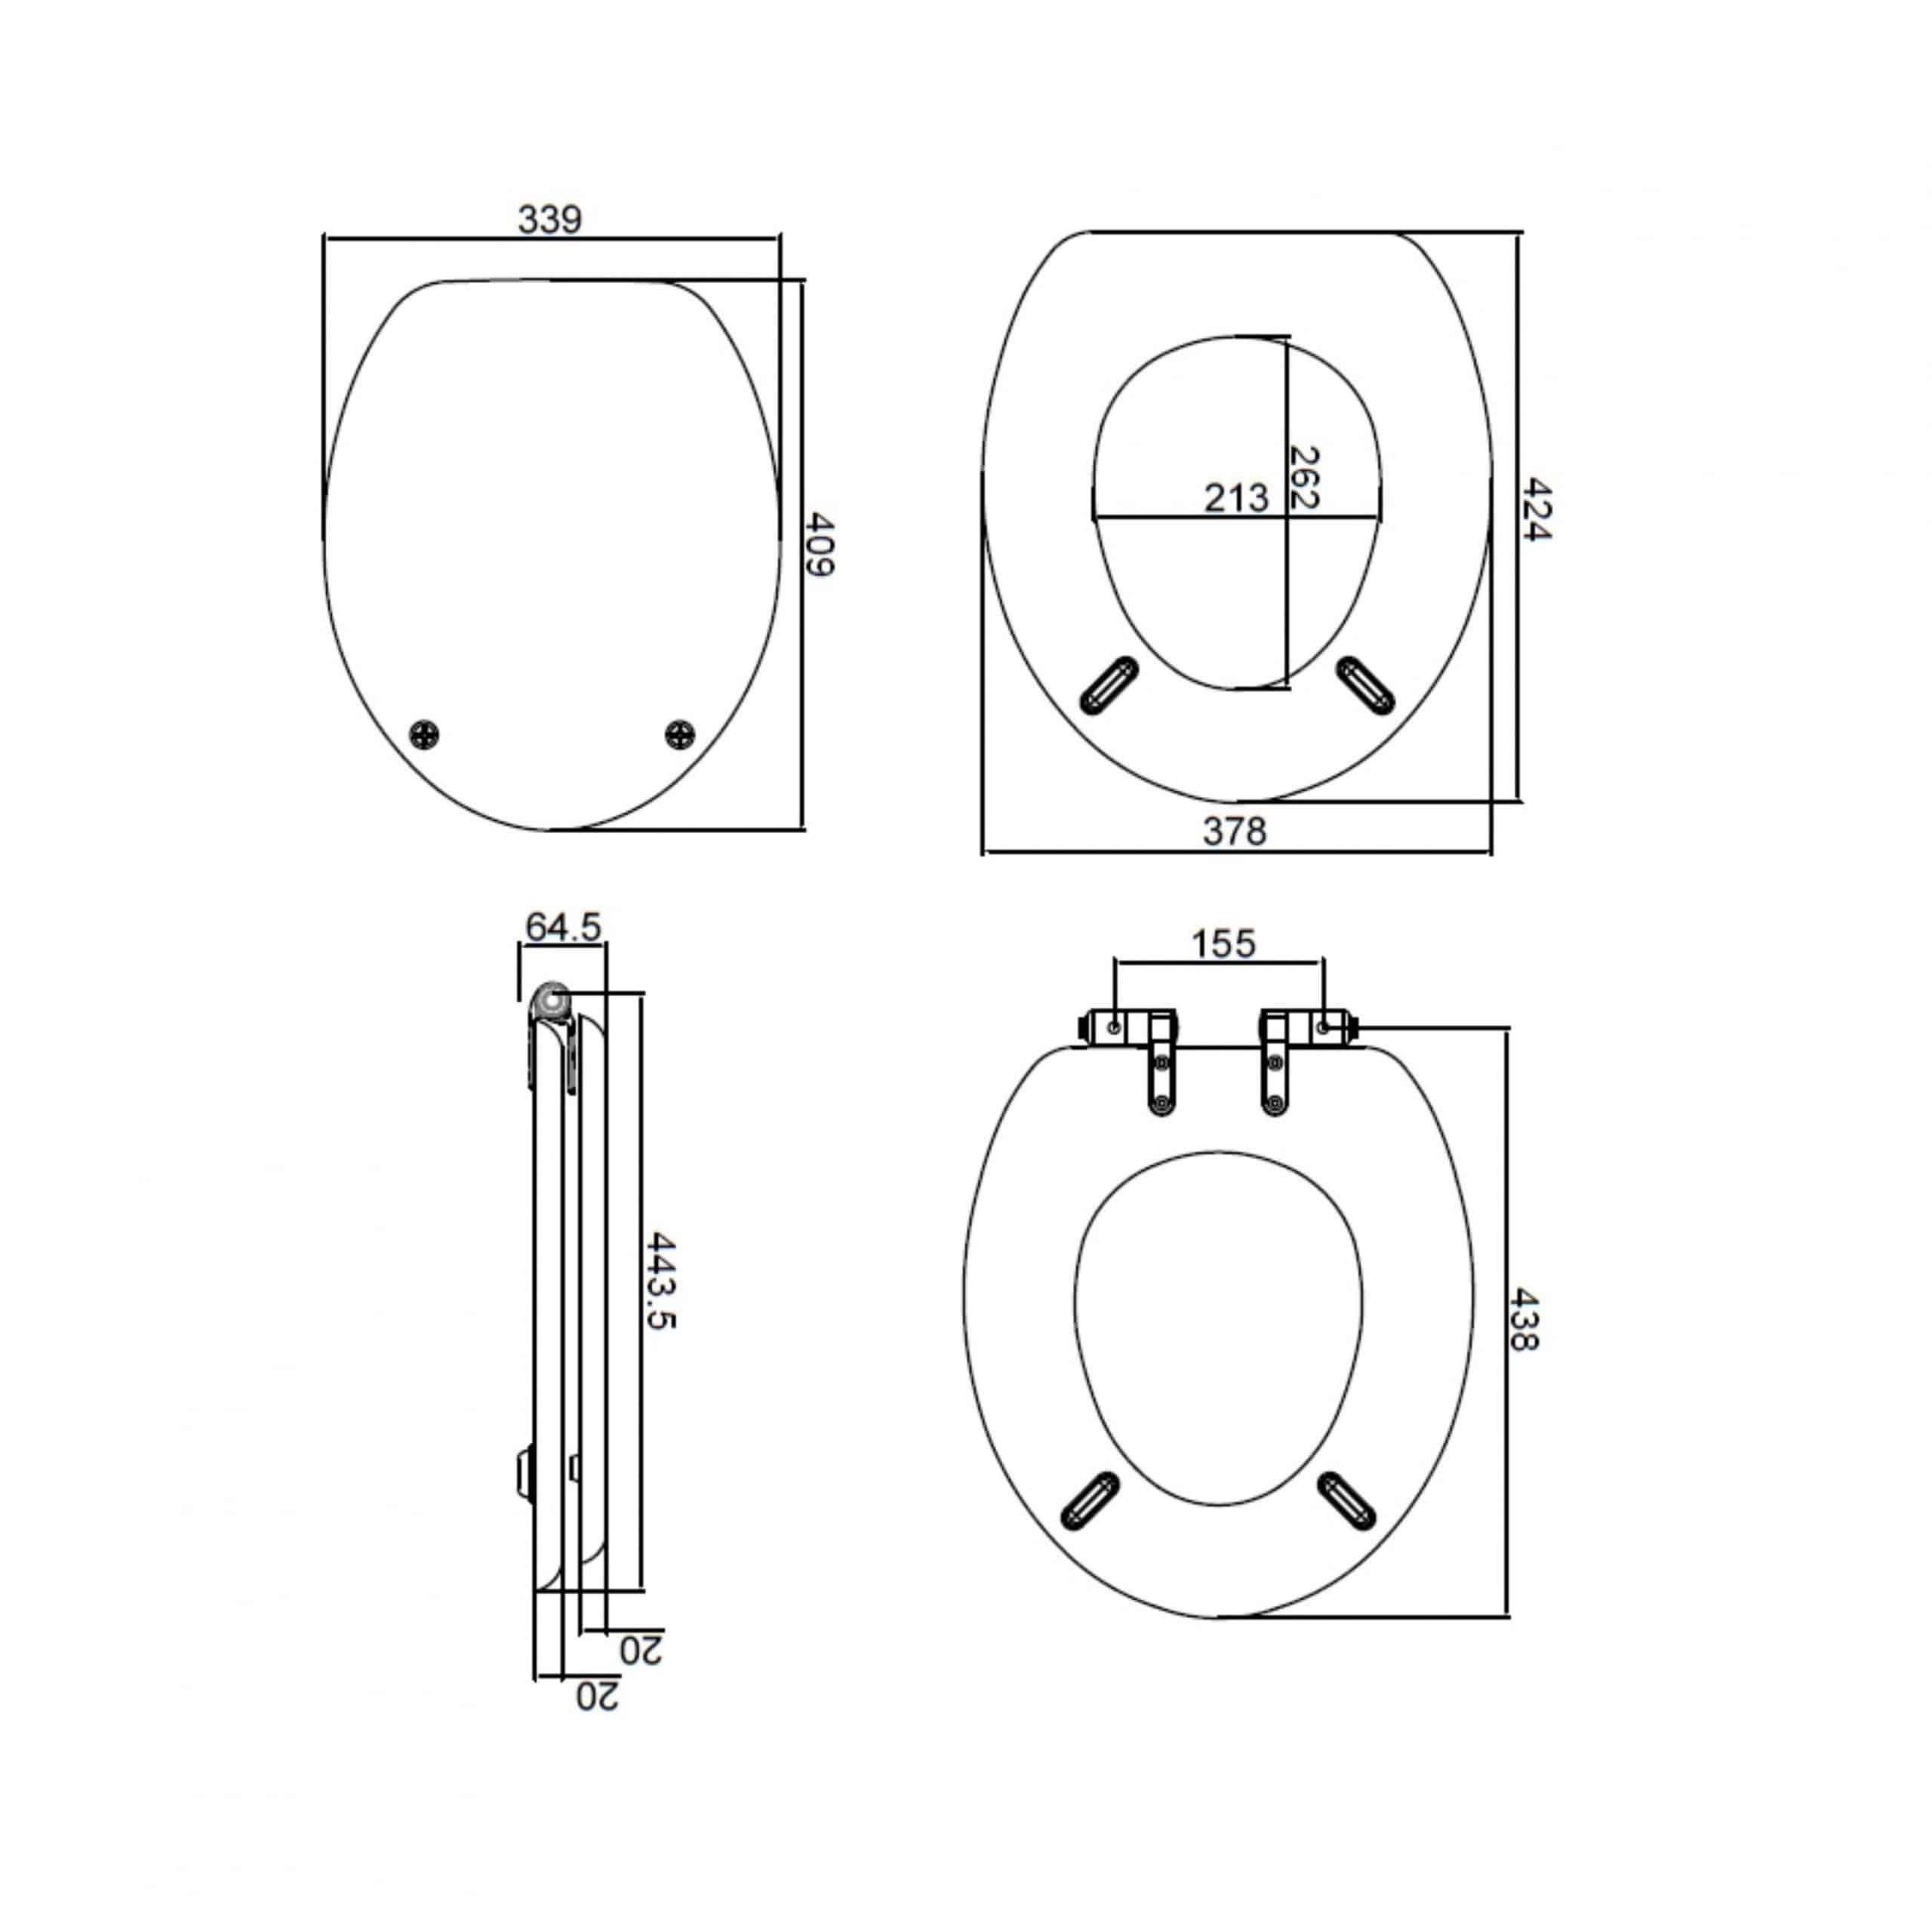 Heritage Wood Seat GW101S Measurements